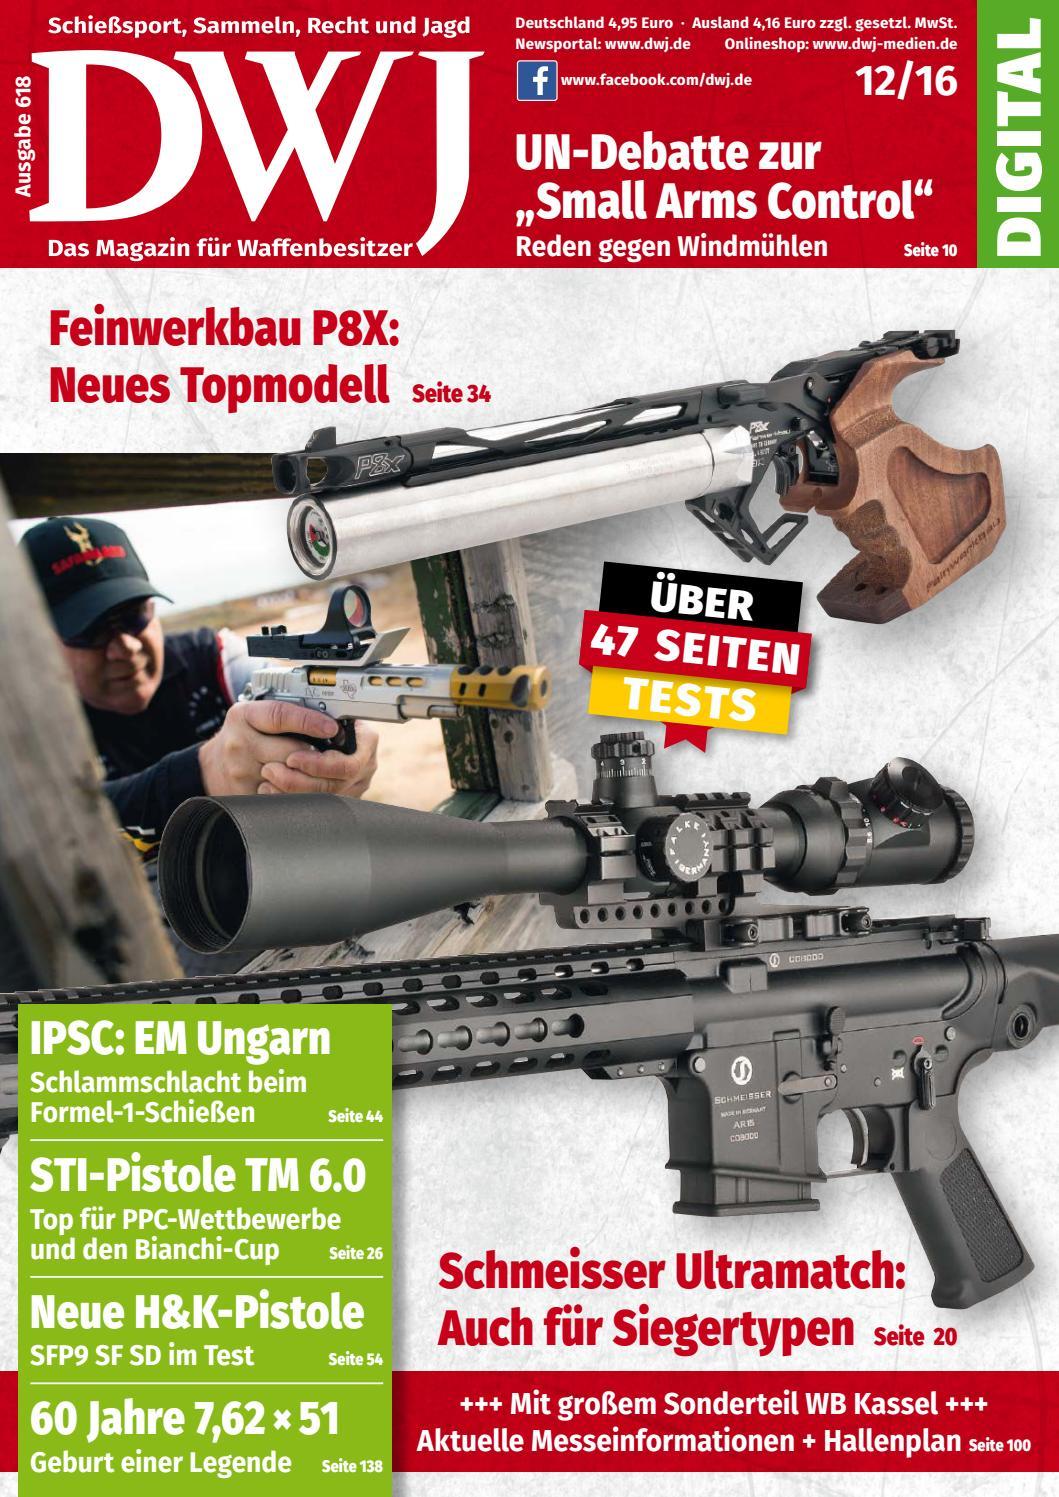 5x Lego Waffe Zubehör Katana Schwert silber sword weapon